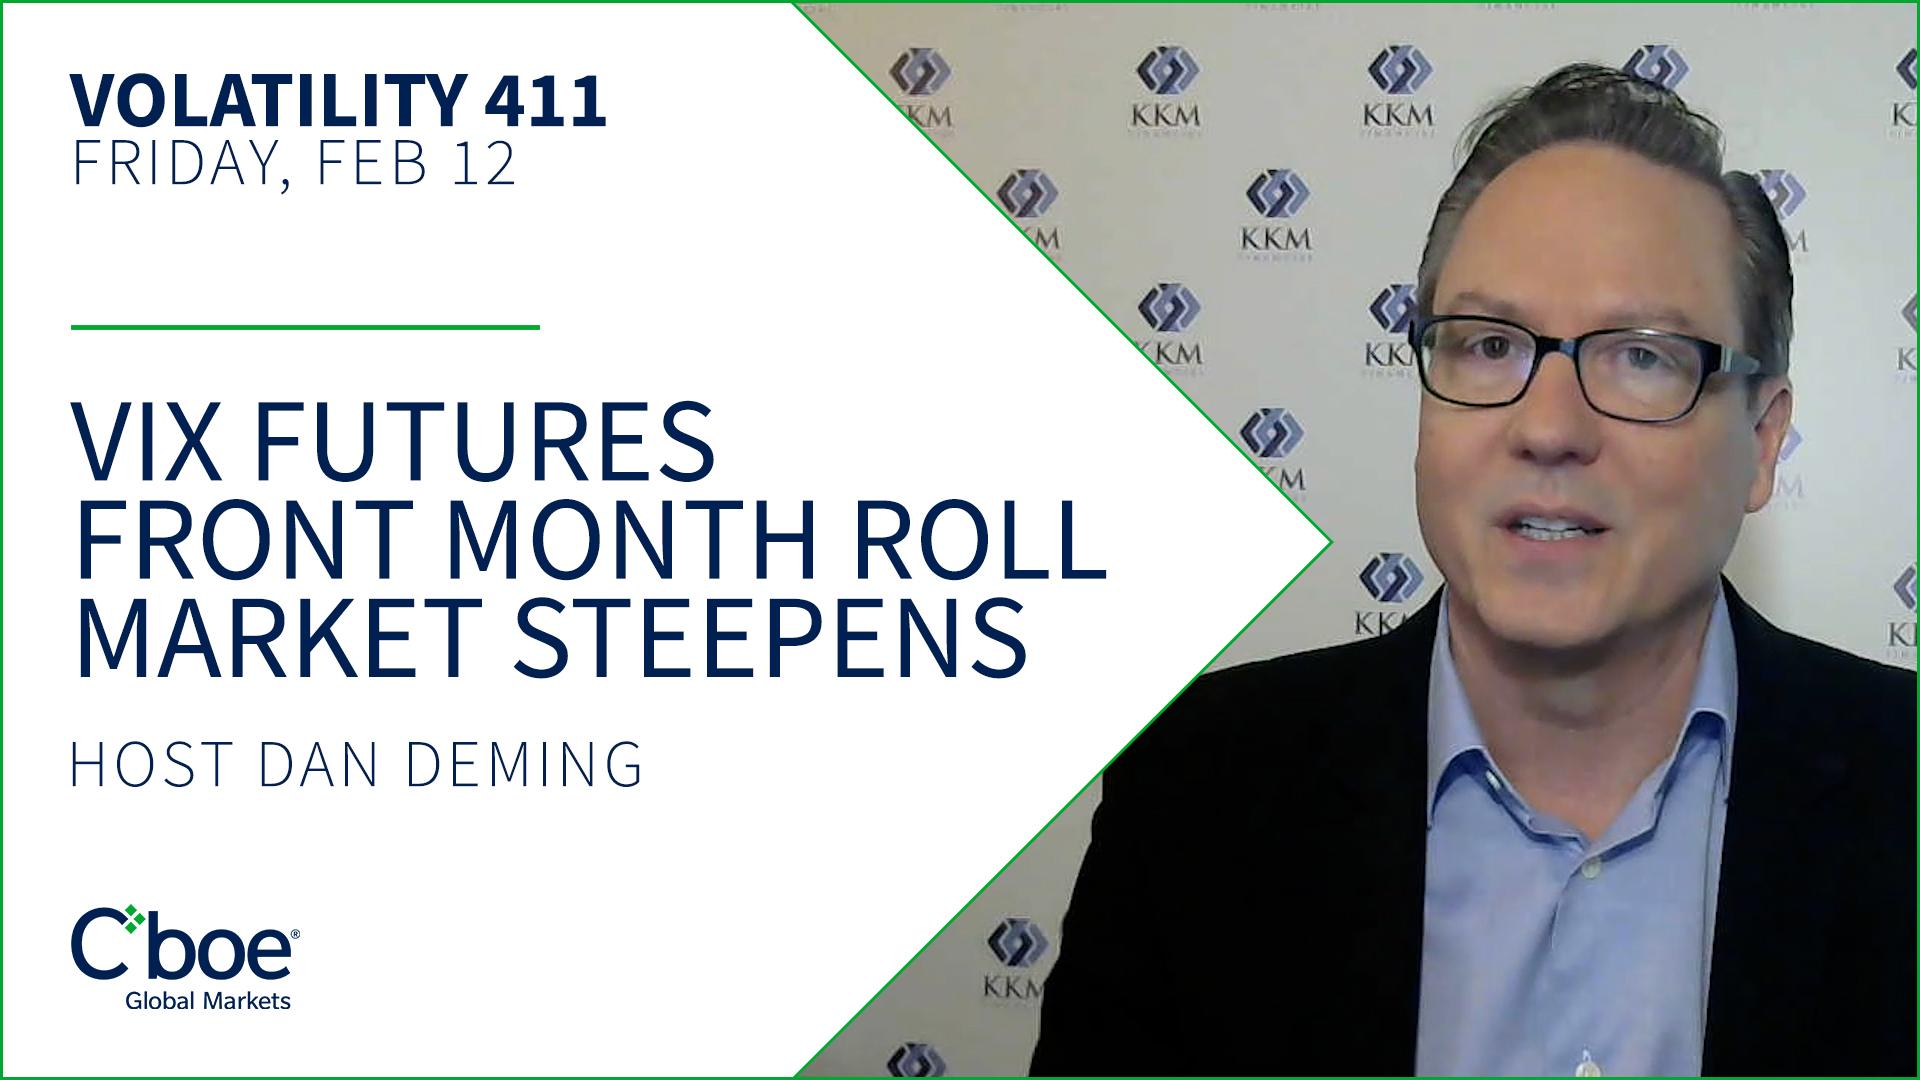 Feb/Mar VIX Futures Roll Market Steepens Thumbnail